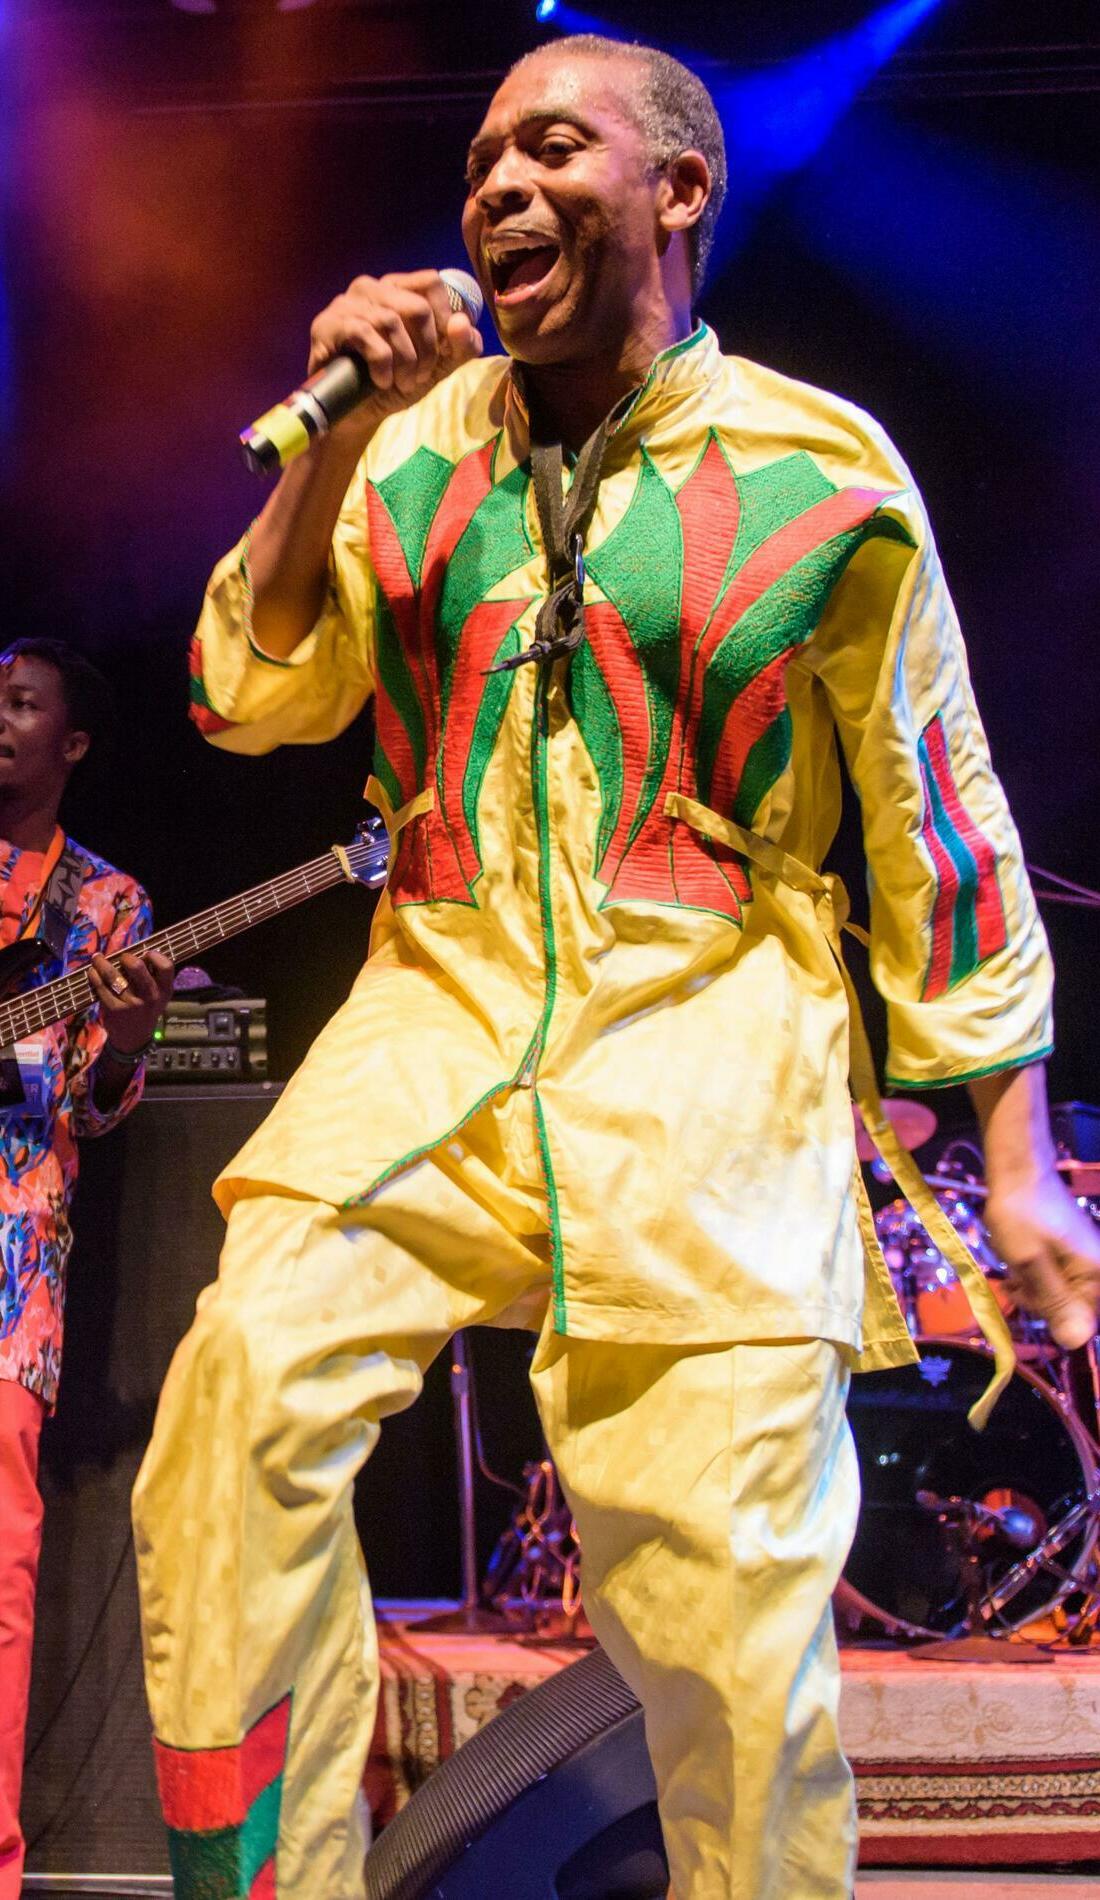 A Femi Kuti & The Positive Force live event